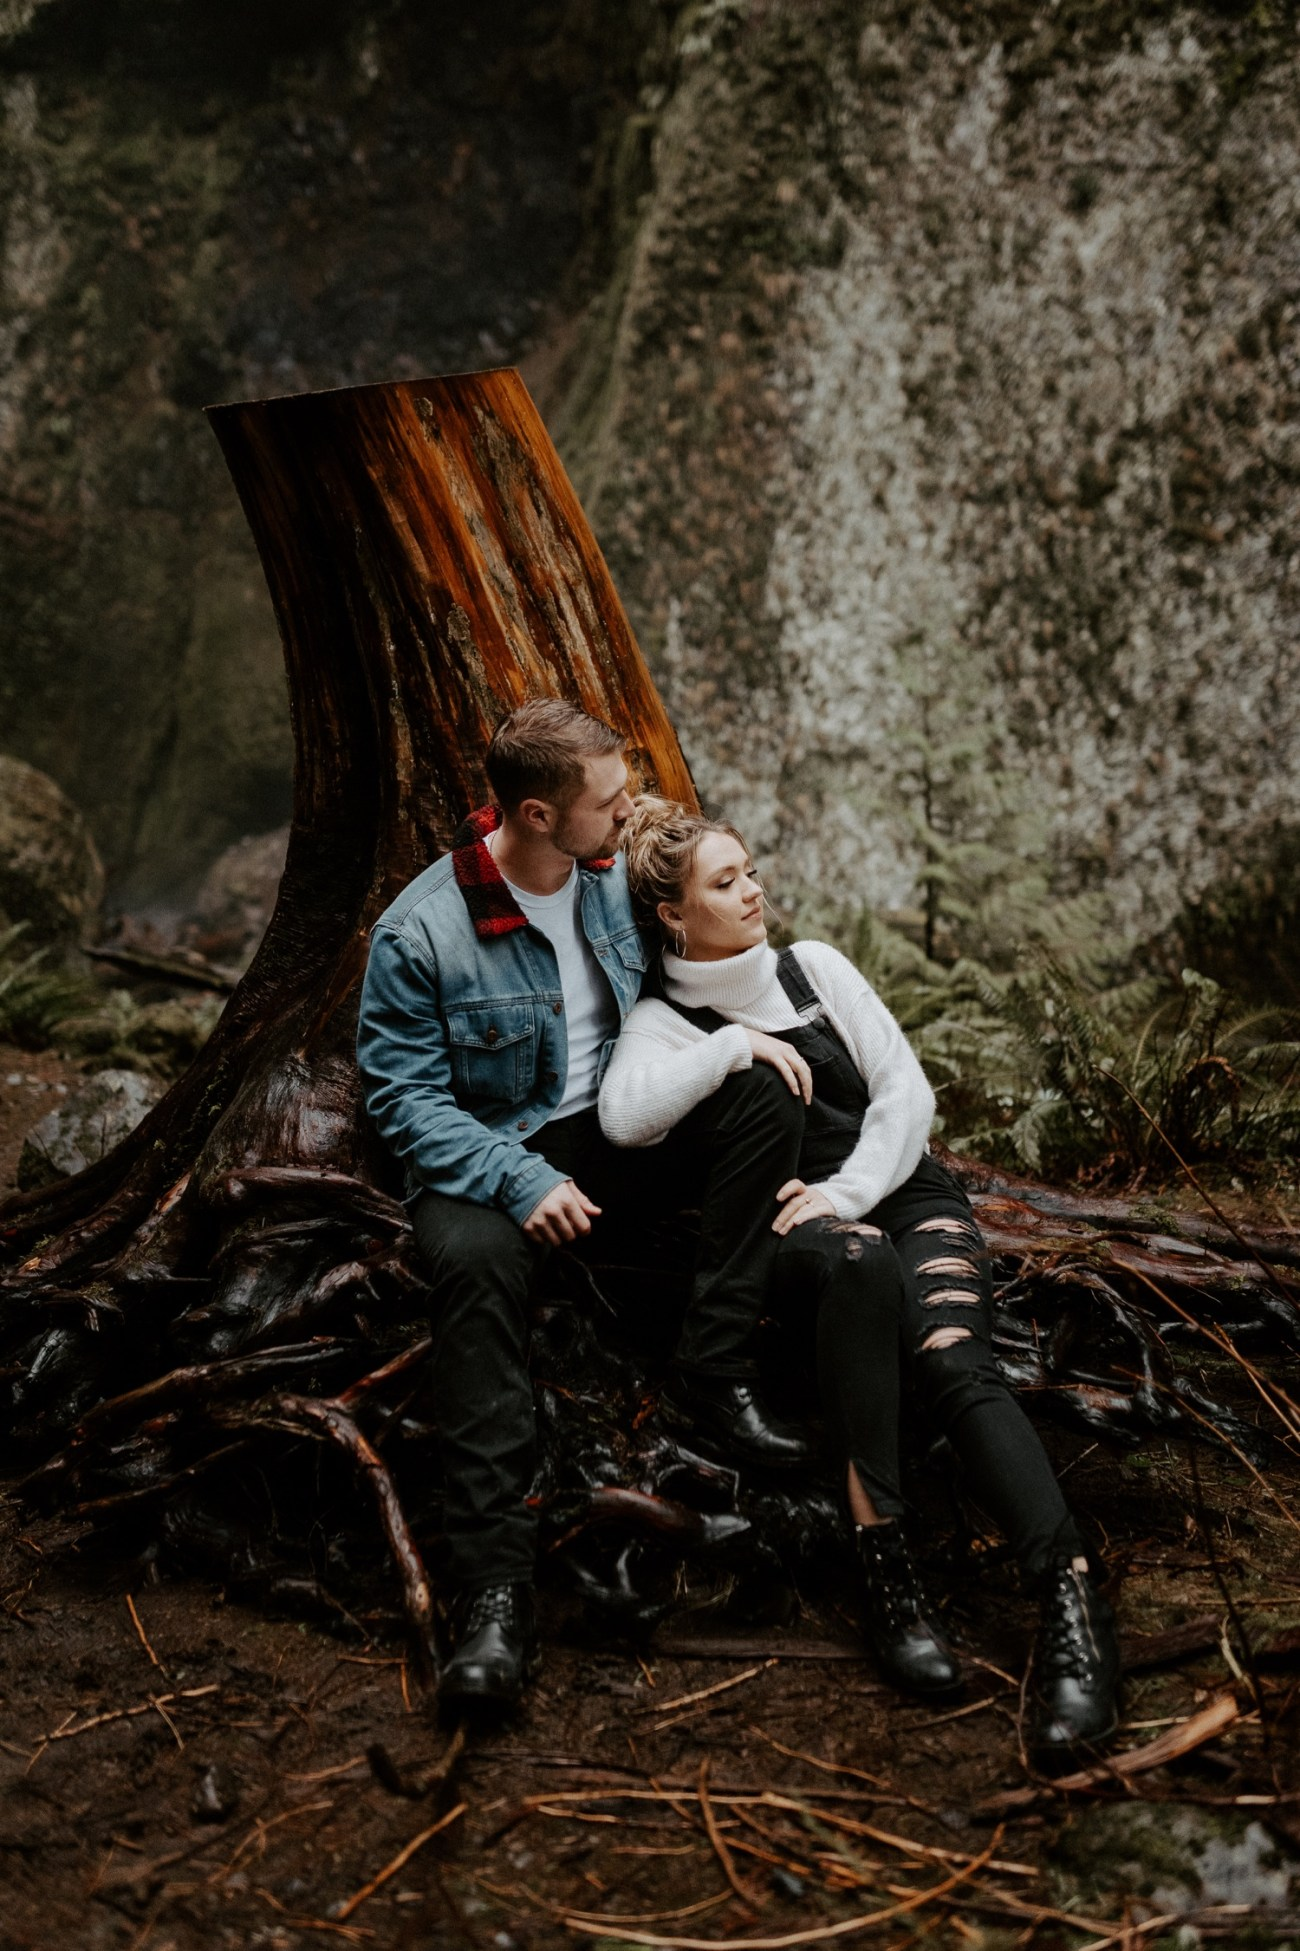 Wahclella Falls Engagement Session Columbia River Gorge Oregon Portland Wedding Photographer PNW Elopement Photographer Bend Wedding Photographer Anais Possamai Photography 050